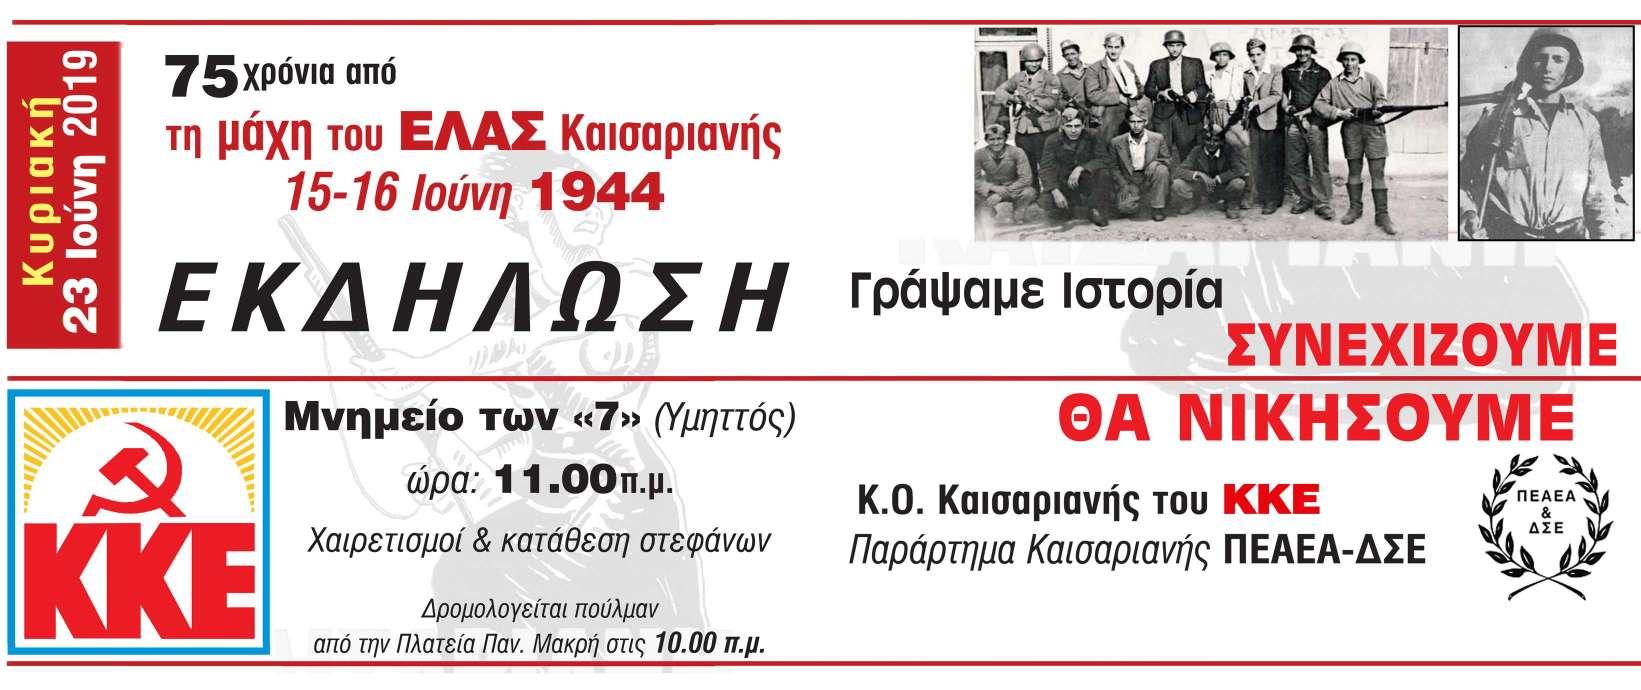 header post ΕΚΔΗΛΩΣΗ ΚΚΕ Καισαρινής «Μνημείο των 7»